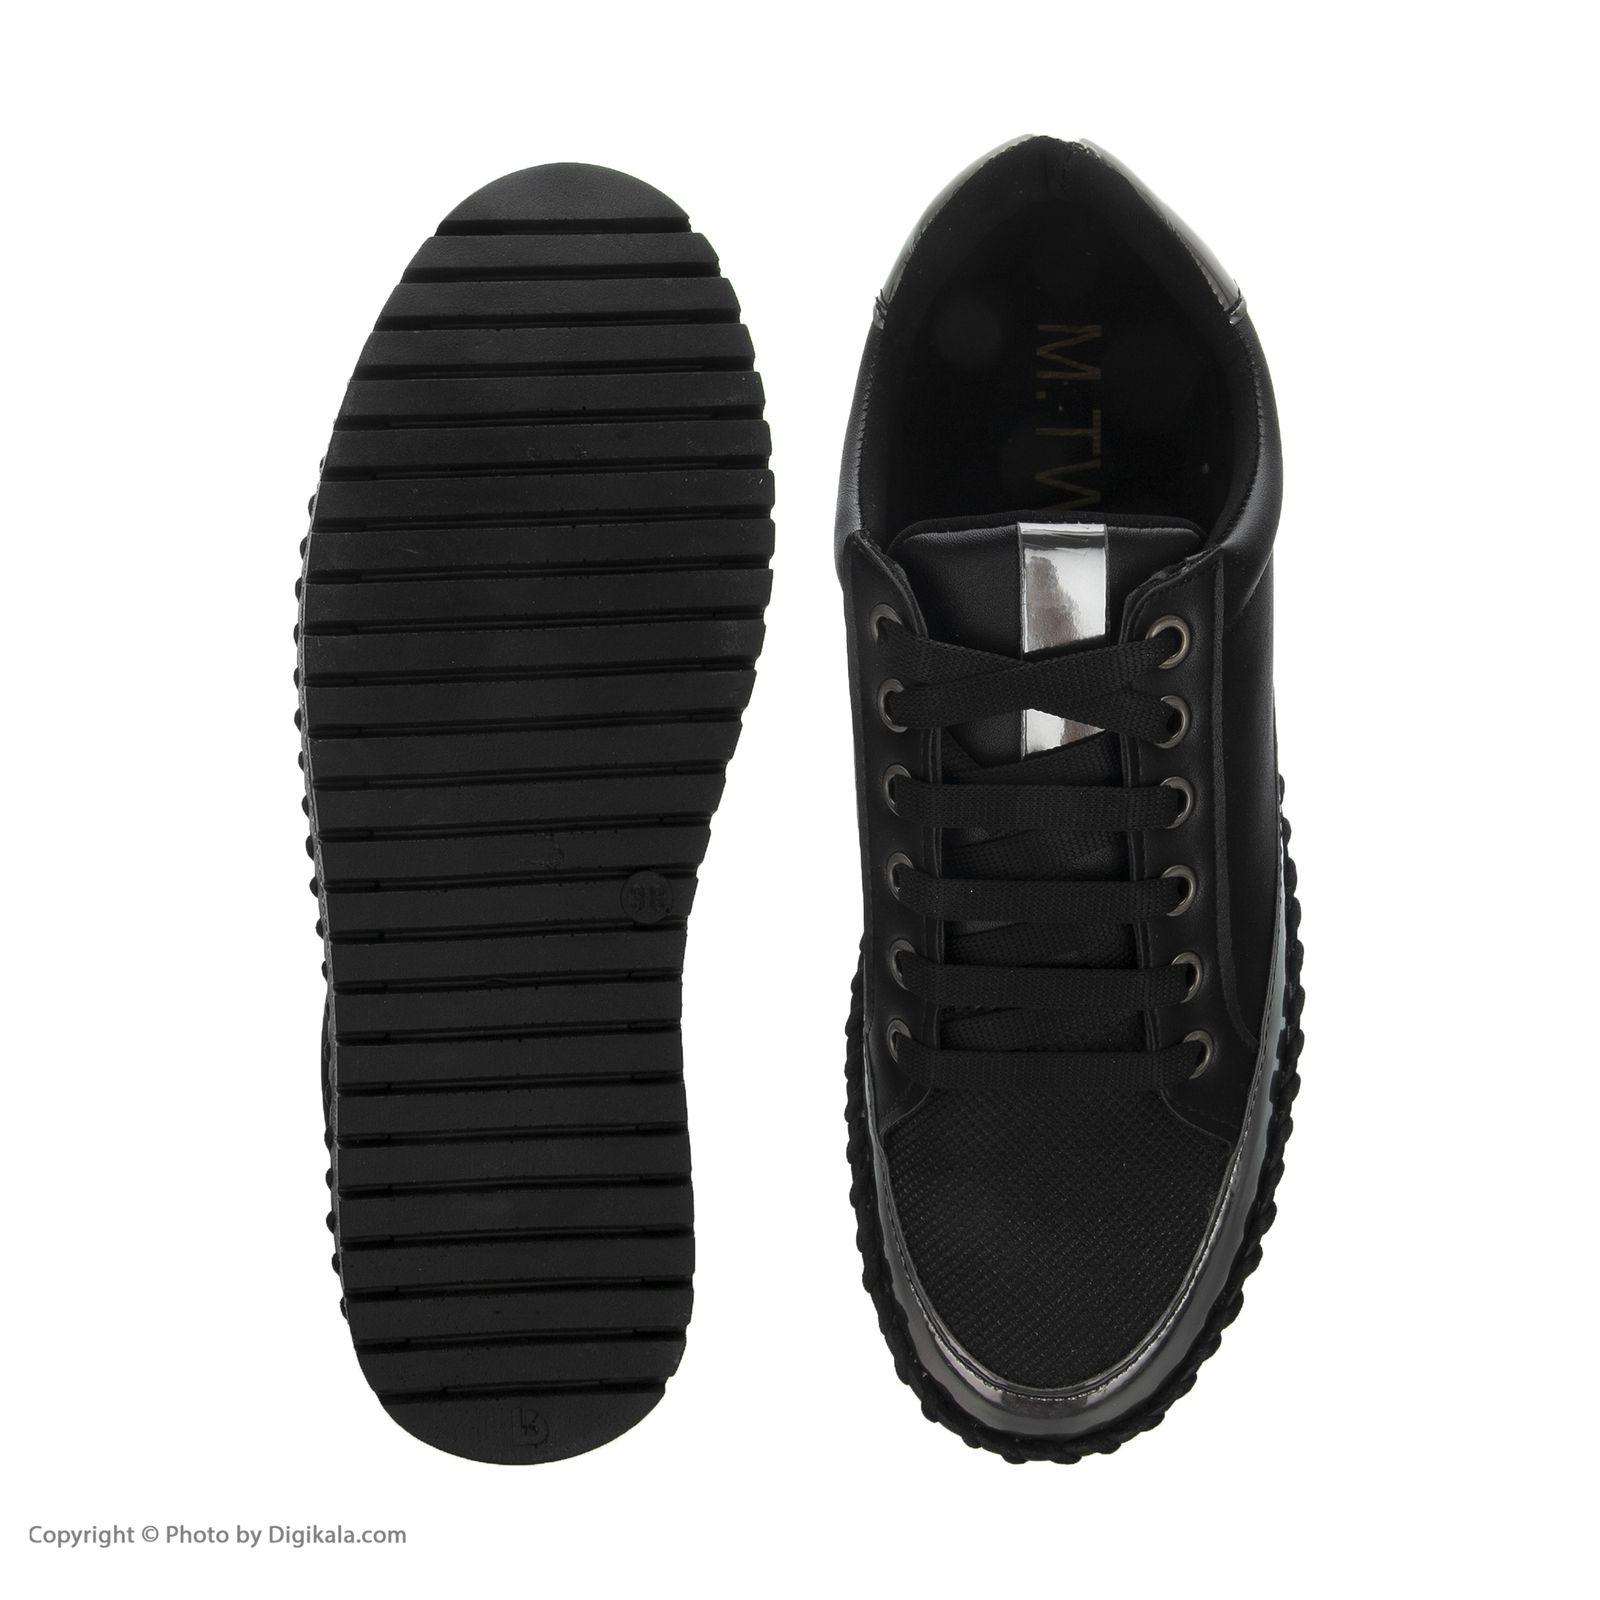 کفش روزمره زنانه ام تو مدل 99-1005 main 1 5